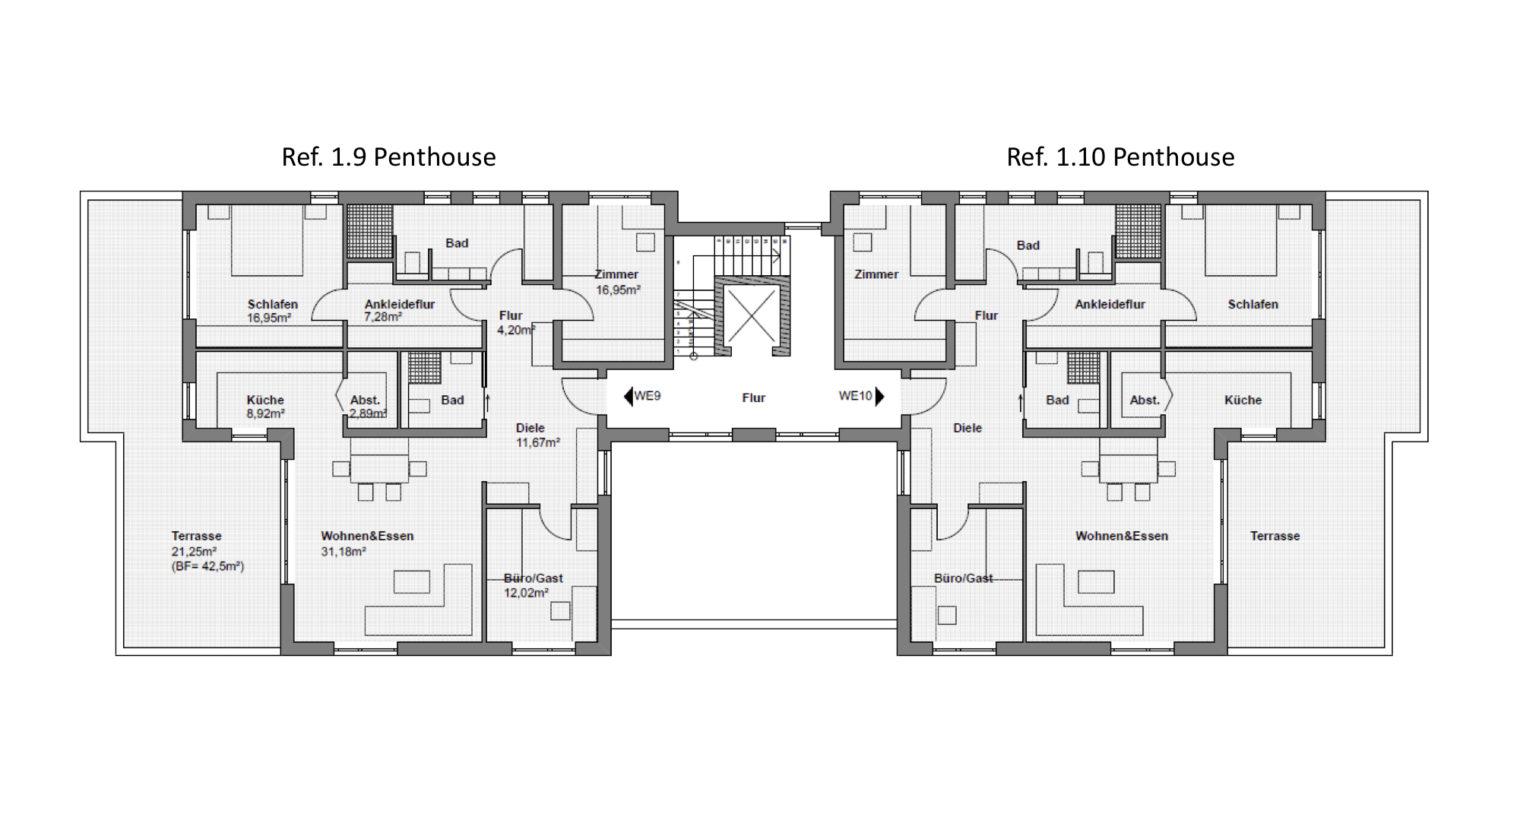 Grundriss-Haus-1-1.9-und-1.10-Penthouse-1520x820